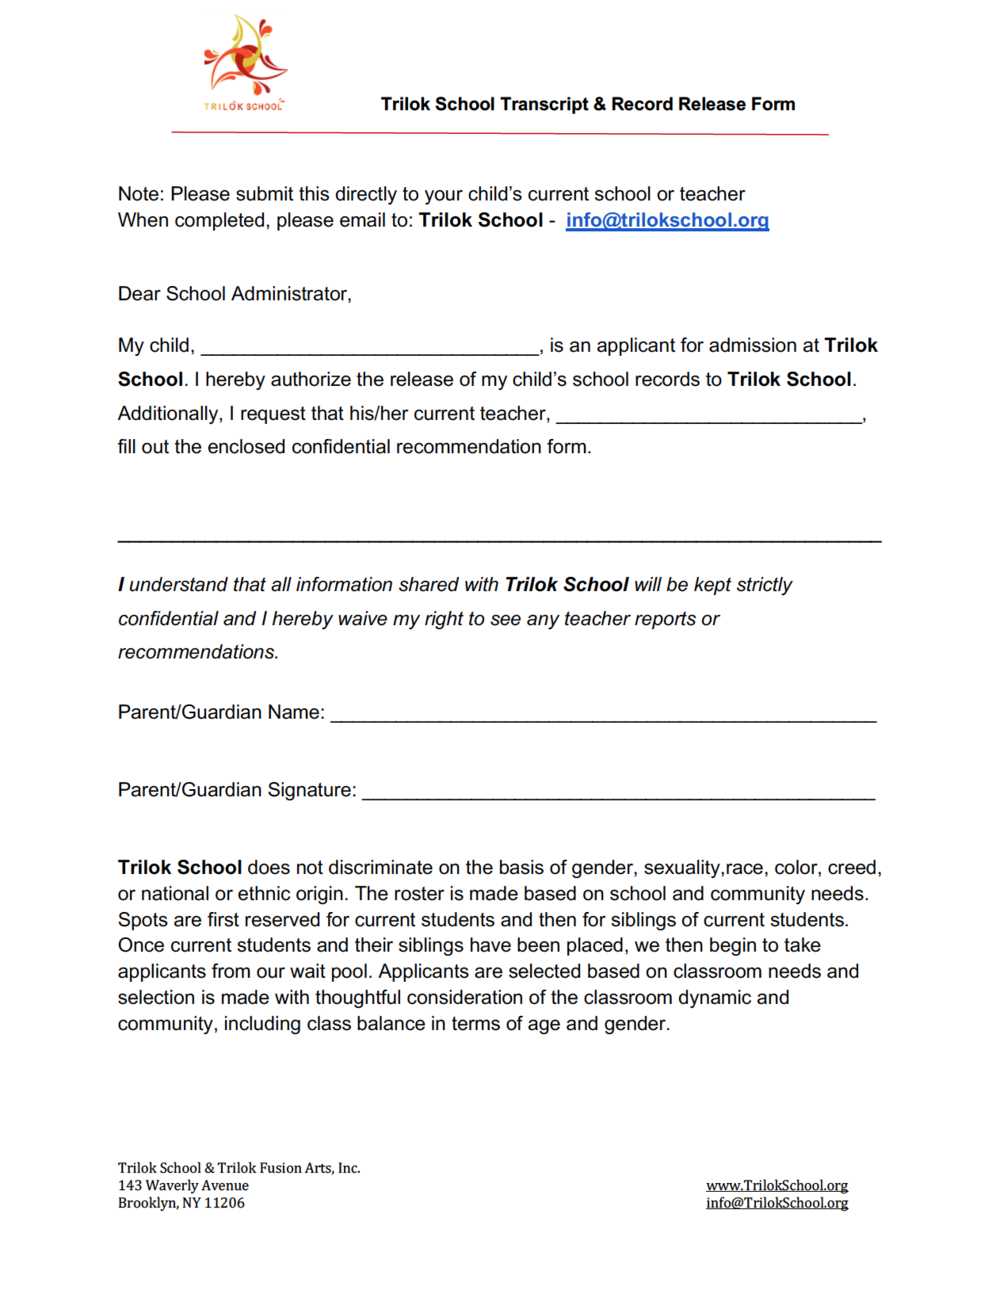 Trilok Transcript & Record Release Form Page 1